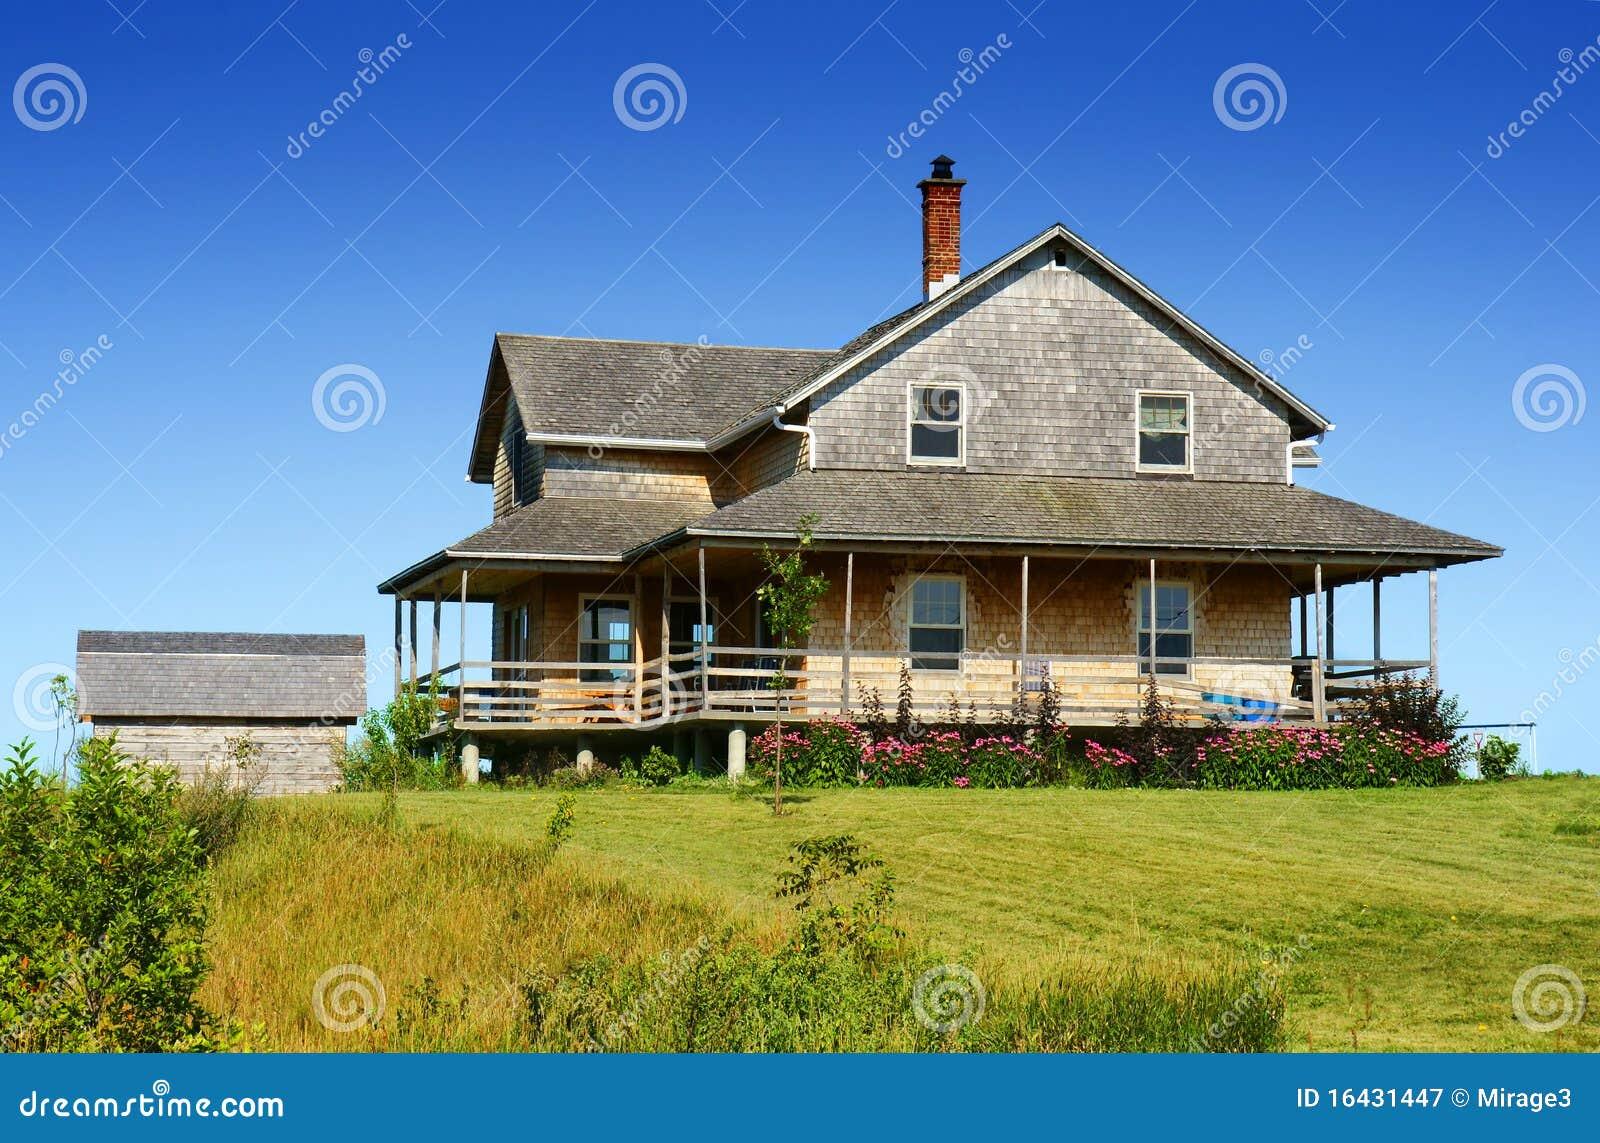 Cedar shingle house royalty free stock photography image for Cedar shingle house